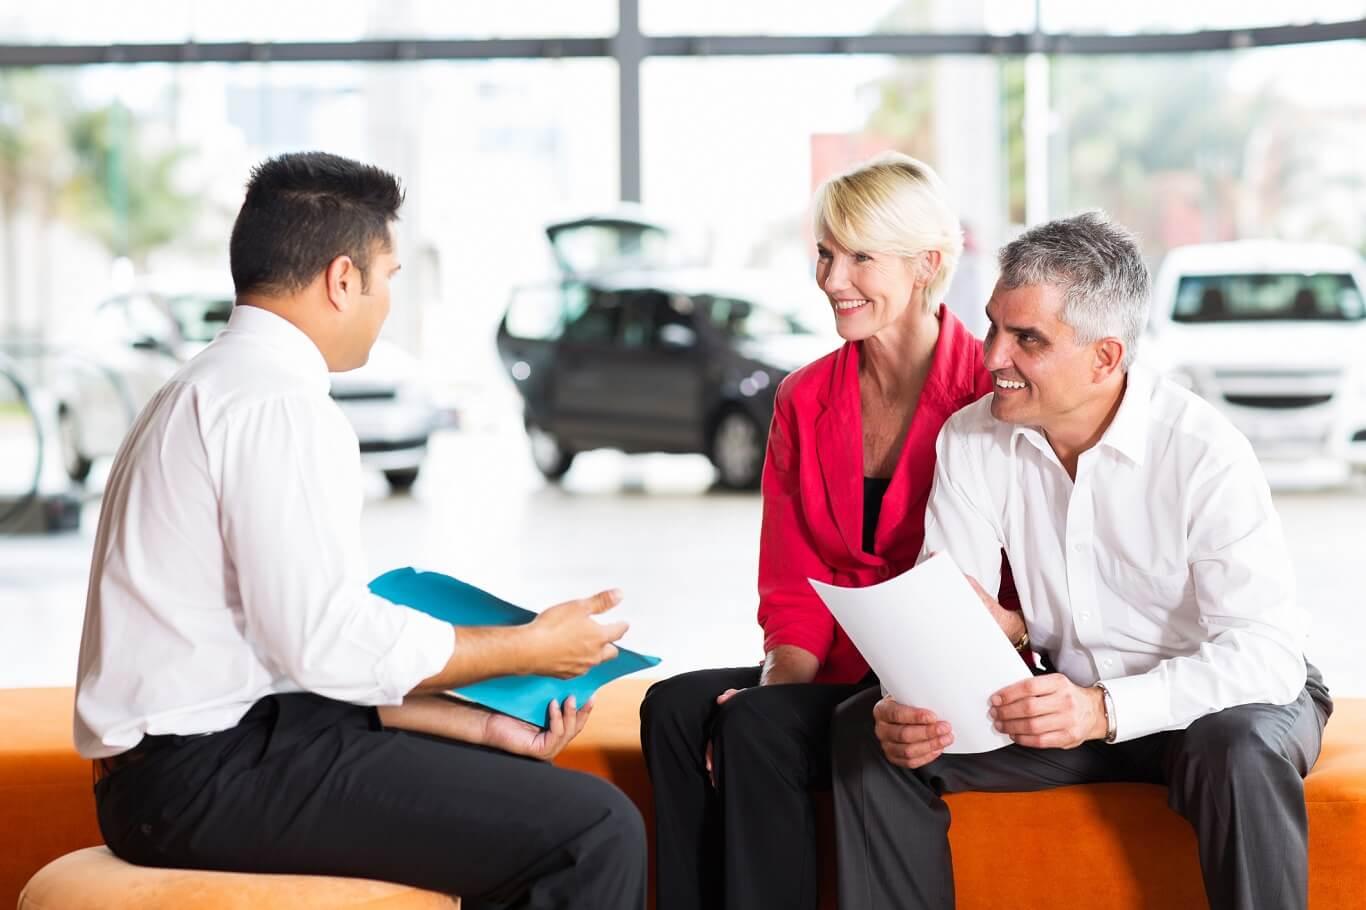 car dealerships taking advantage of elderly